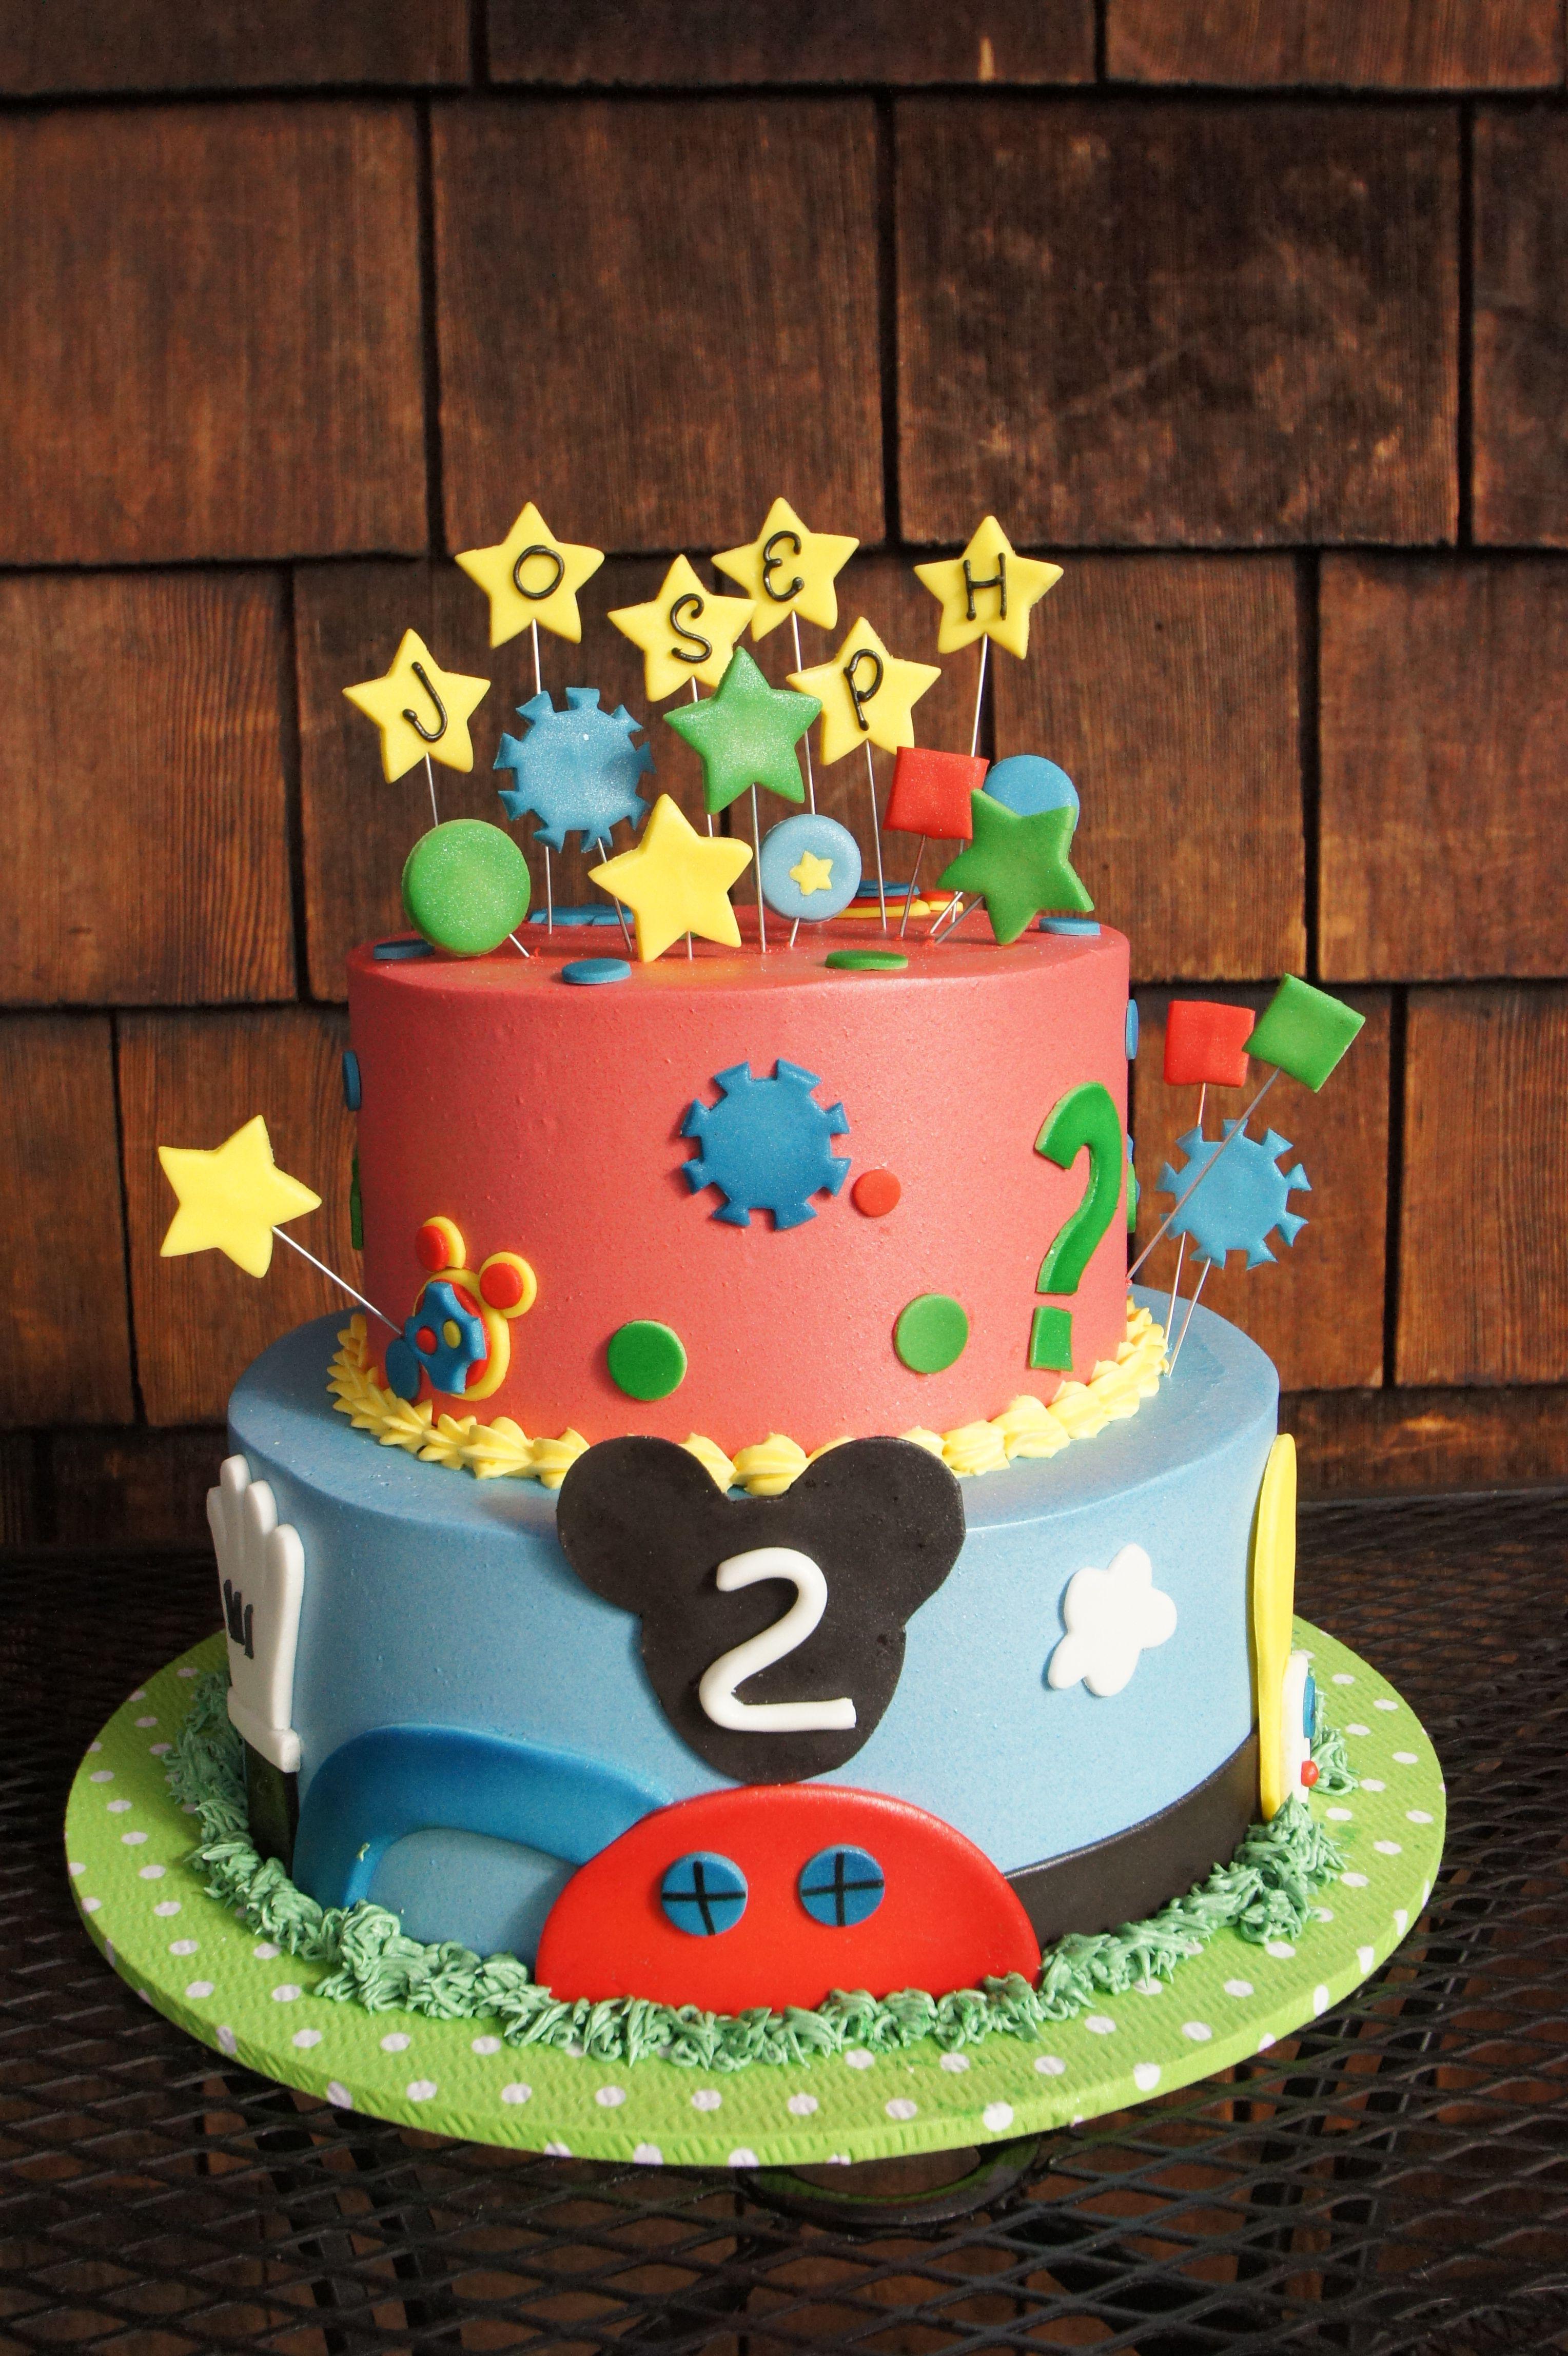 Colorful Disney Imagineer themed birthday cake